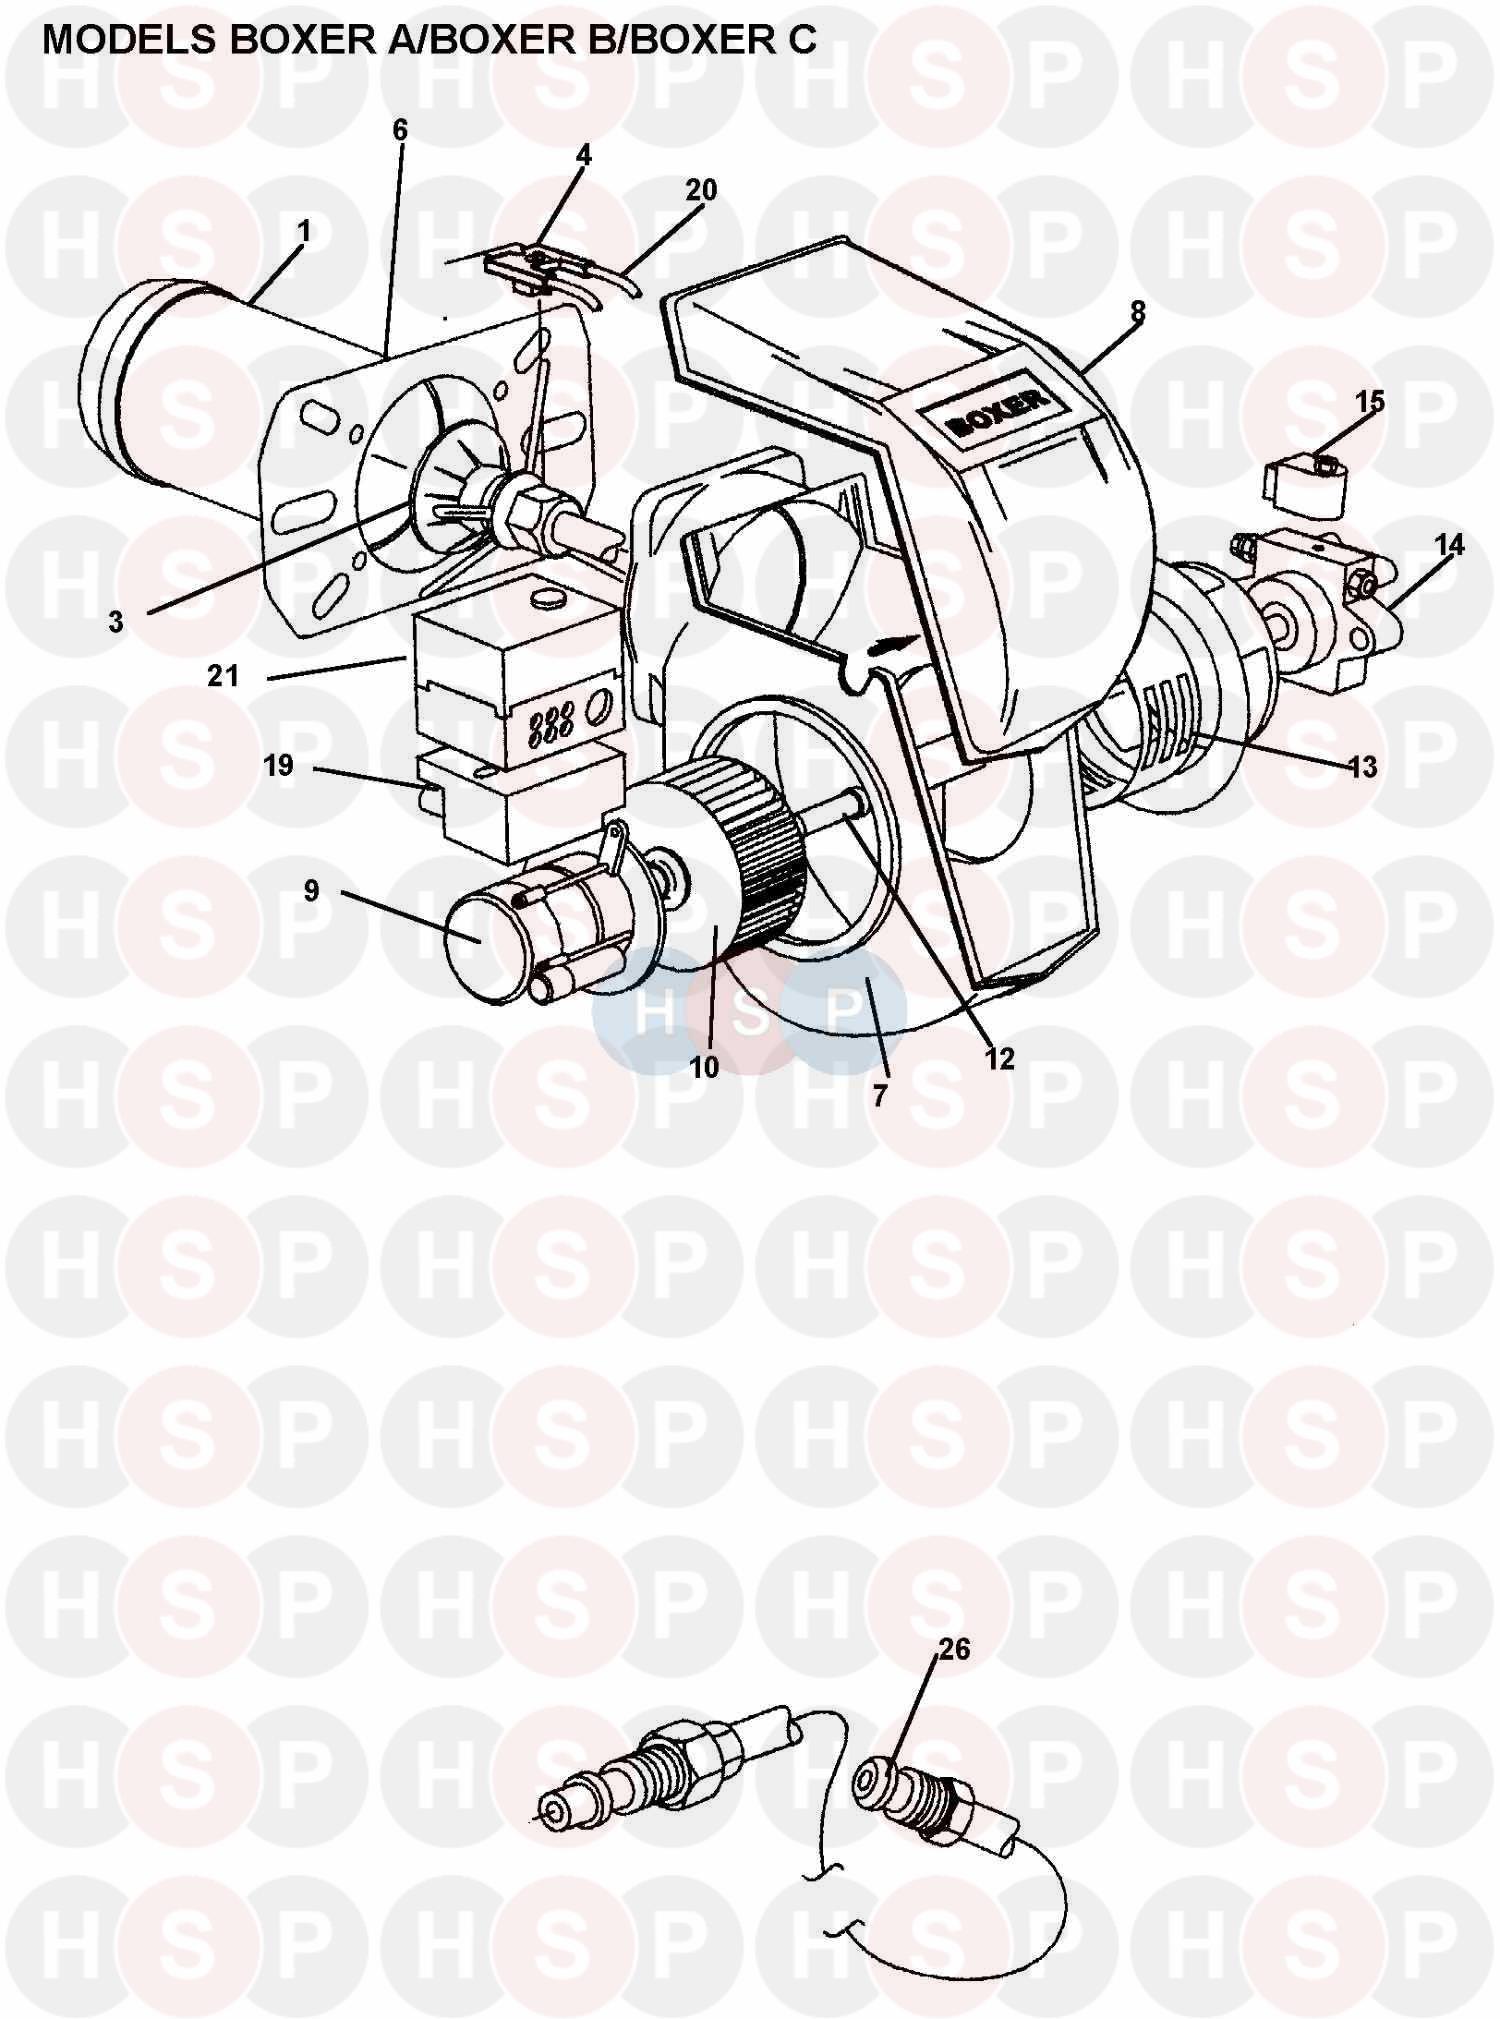 Nu-Way BOXER C (BURNER 1) Diagram | Heating Spare Parts on